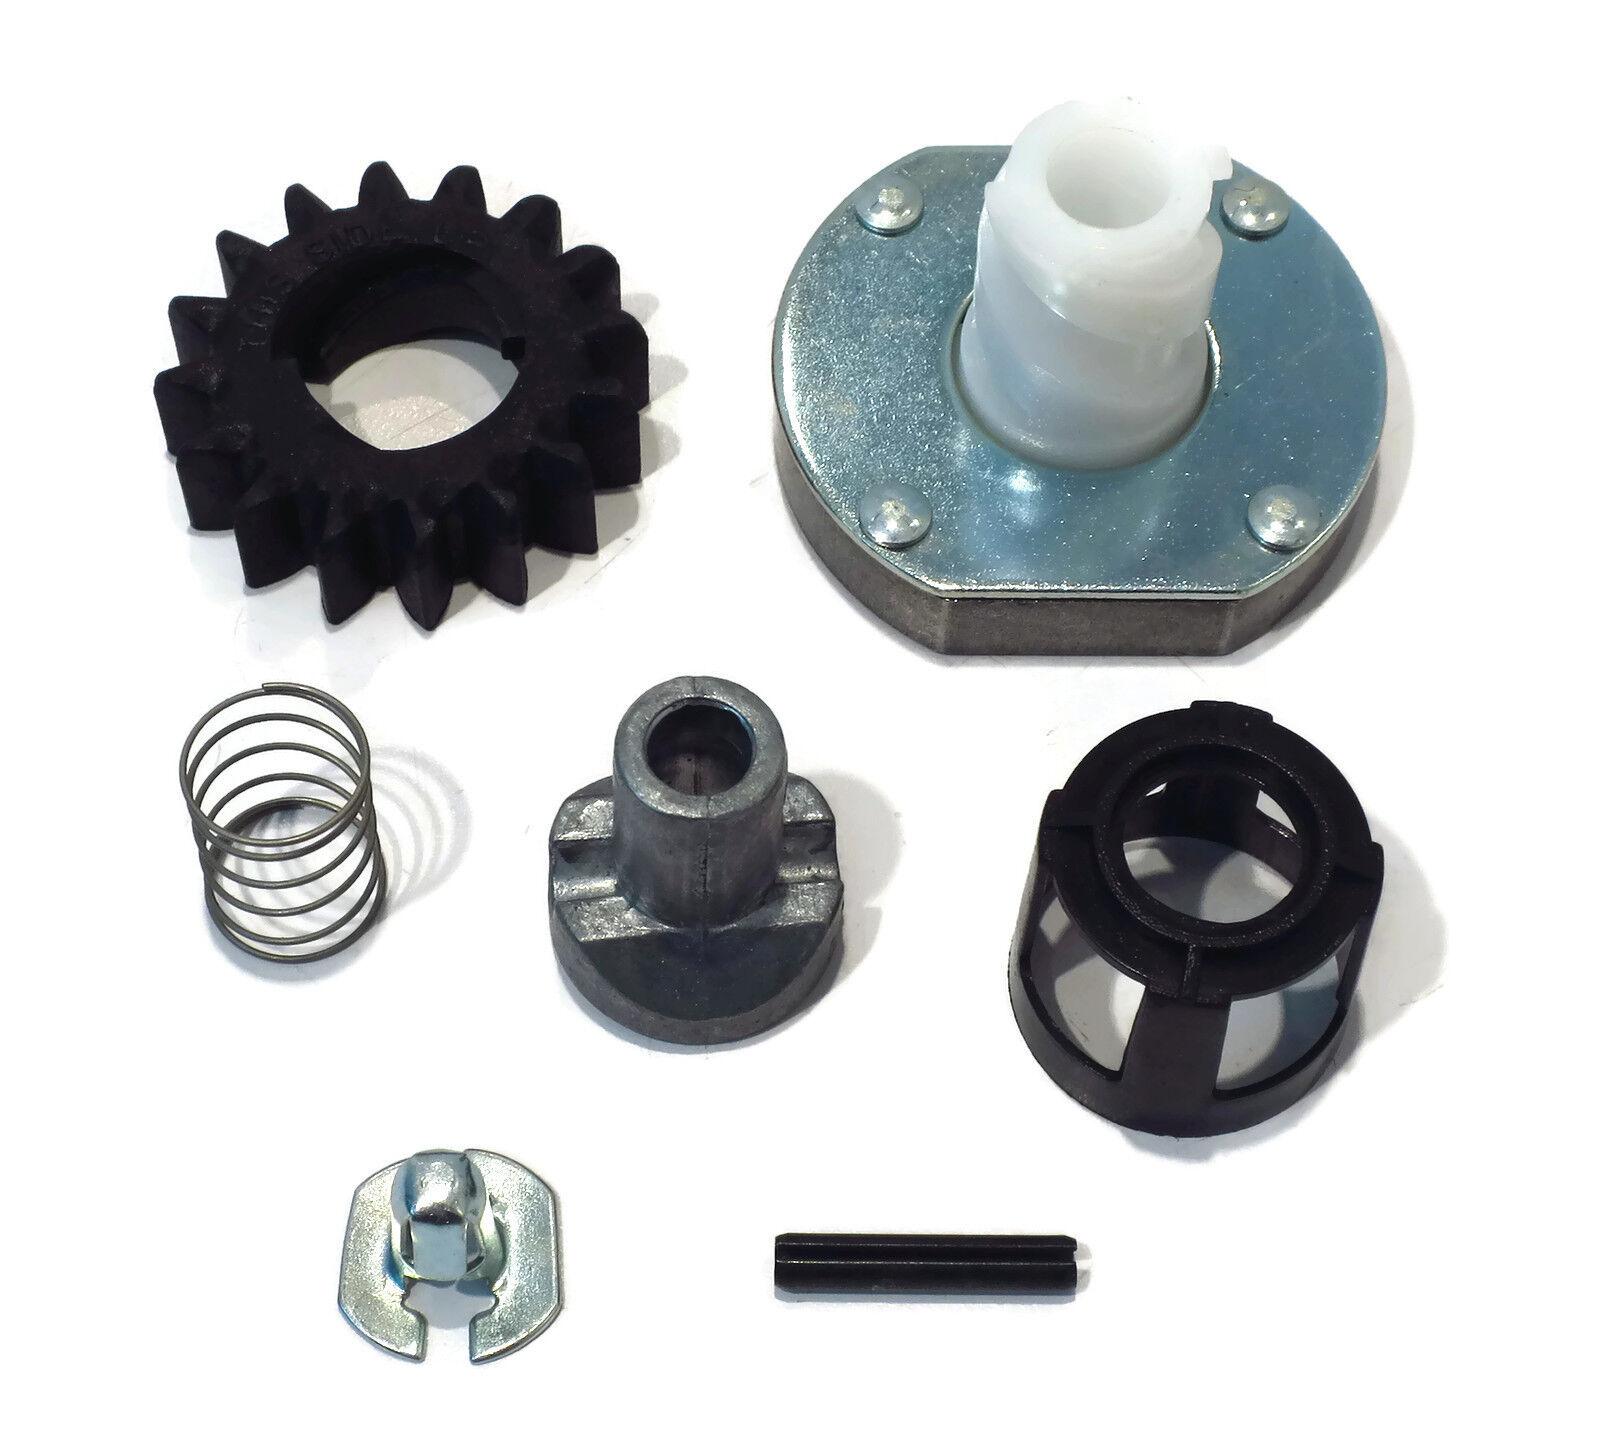 Electric Starter Bendix Drive Gear Kit W// Roll Pin Fits Briggs 495878 696540